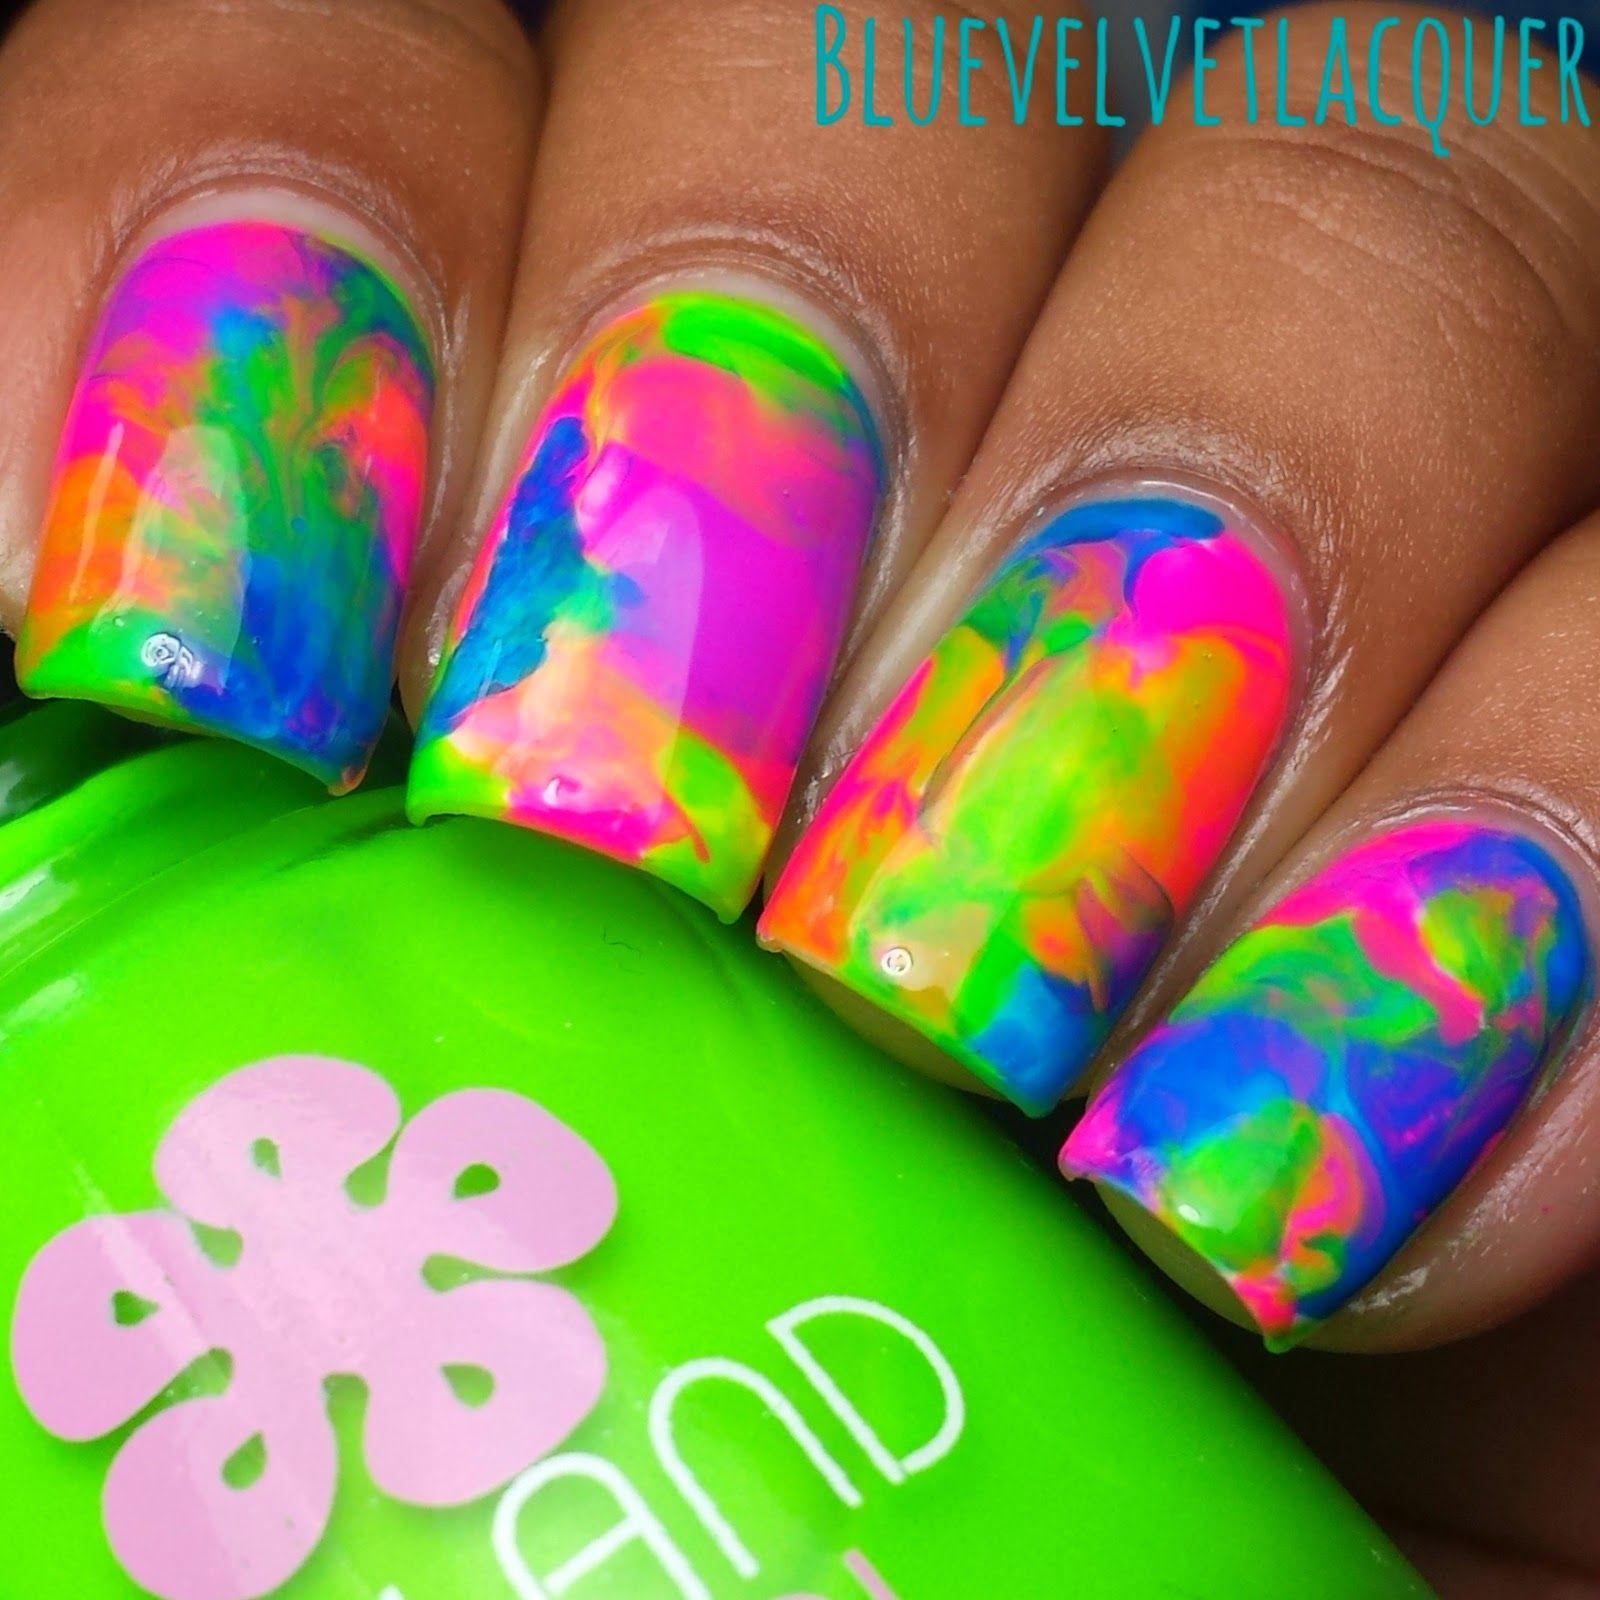 Blue Velvet Lacquer Twinsie Tuesday Summer Lovin Neon Dry Marble Nail Art Plus Tutorial Neon Nail Art Neon Toe Nails Vibrant Nails